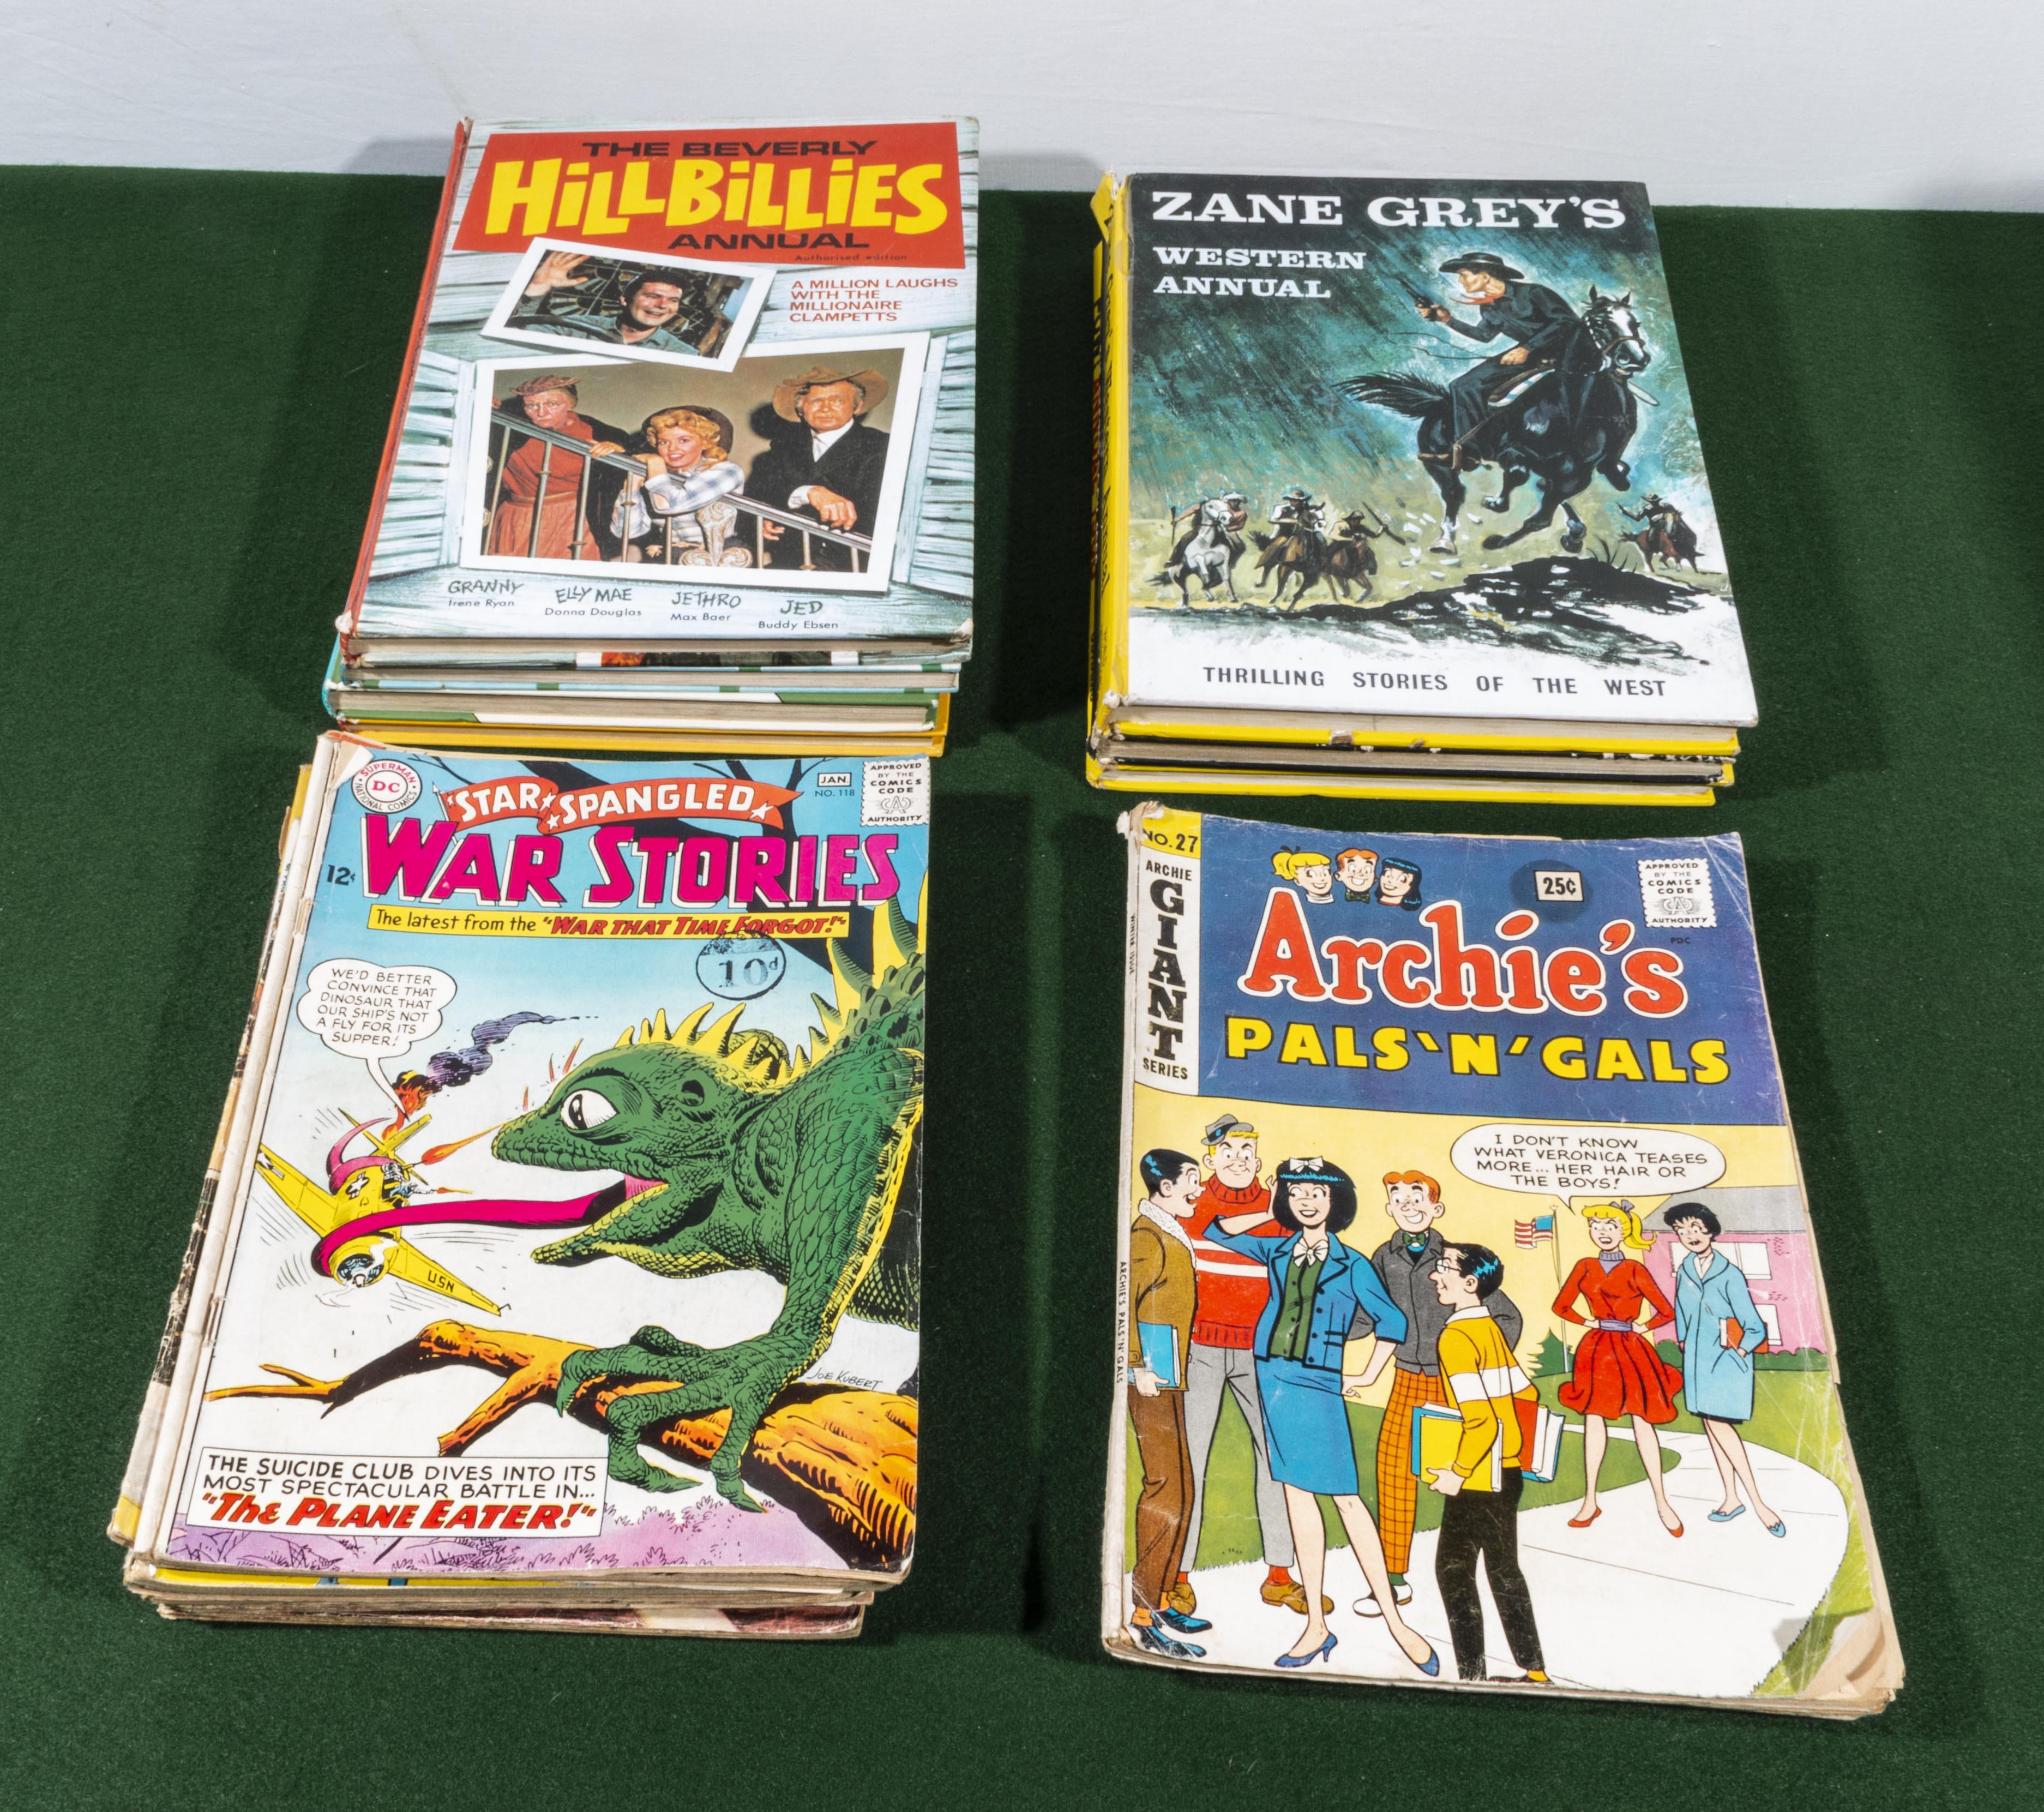 Lot 25 - A box of books and comics